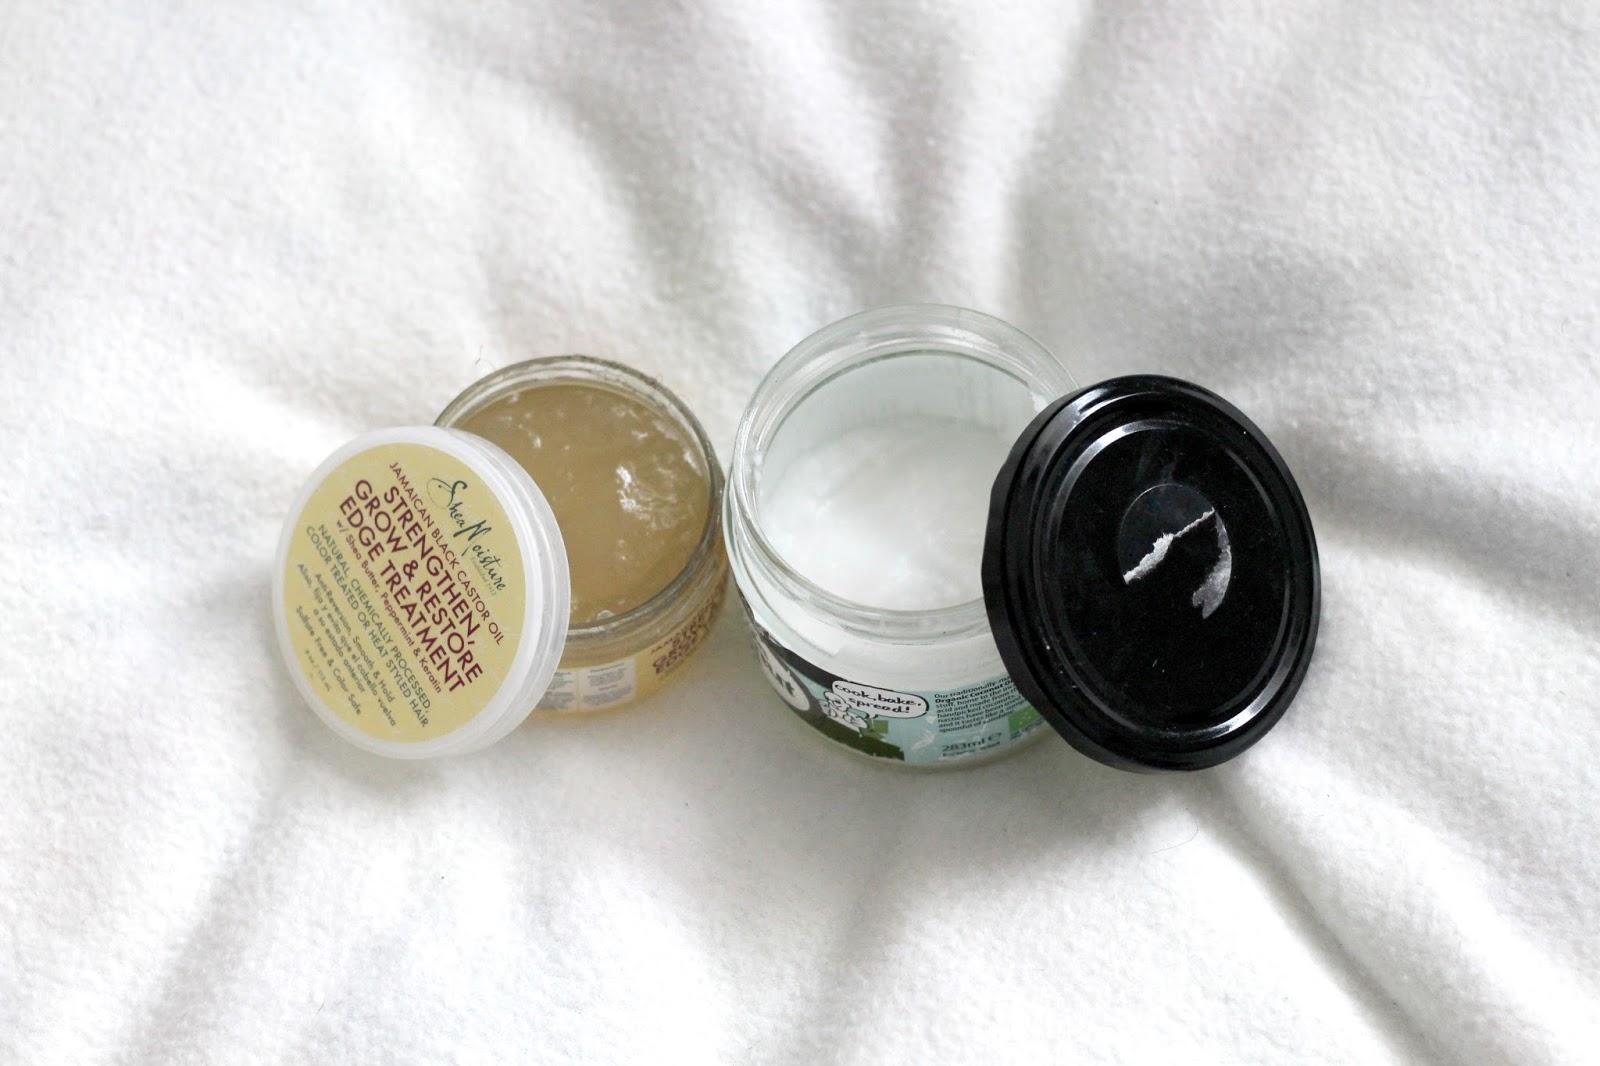 shea moisture jamaican black castor oil review